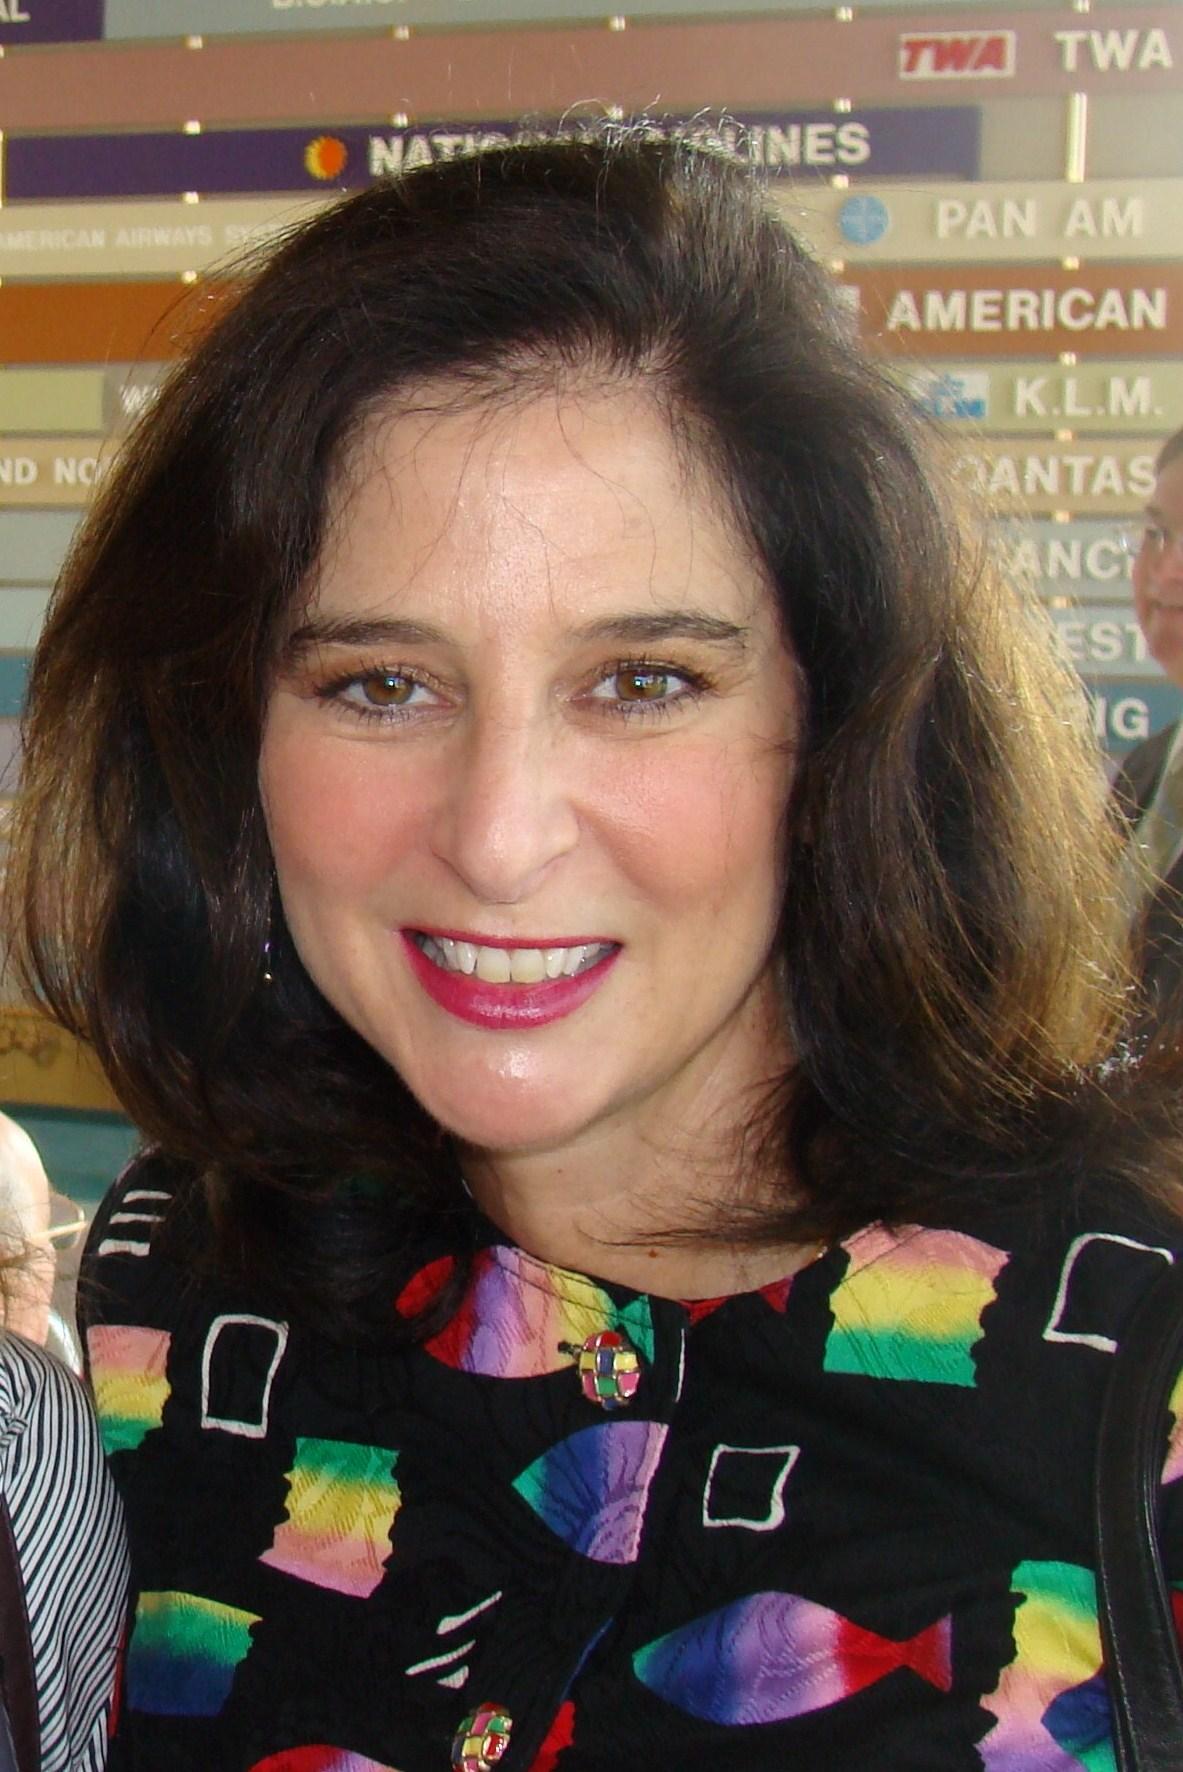 Catherine Kennedy, TJDAS Press Conf, 23 Mar '10.JPG